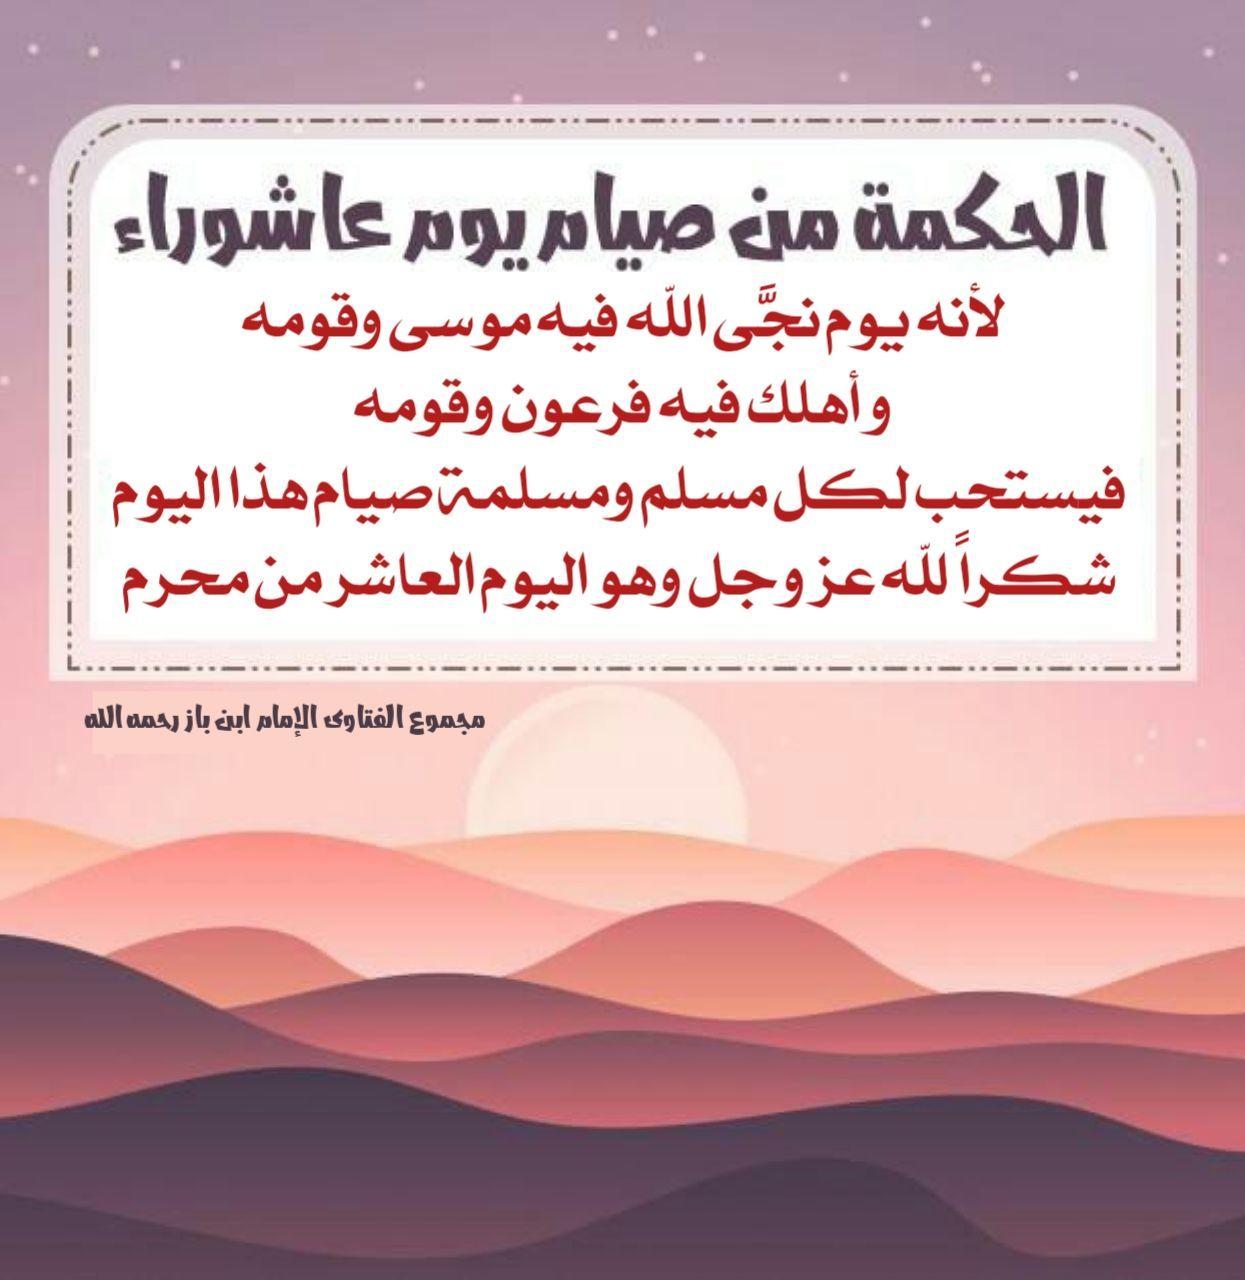 Pin By الأثر الجميل On أقوال الصحابة والعلماء Islam Quran Islam Quran